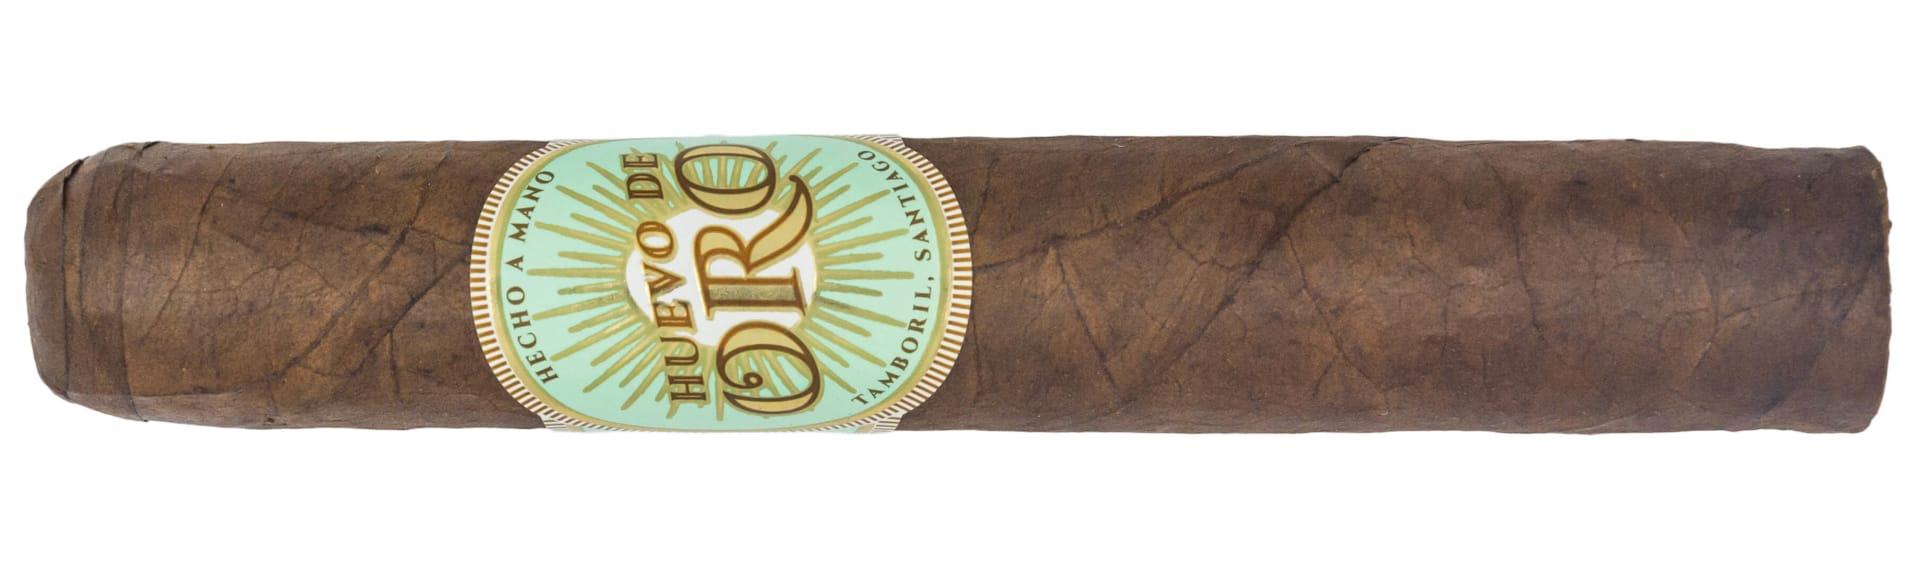 Blind Cigar Review: Camaleón | Huevo de Oro Robusto Featured Image